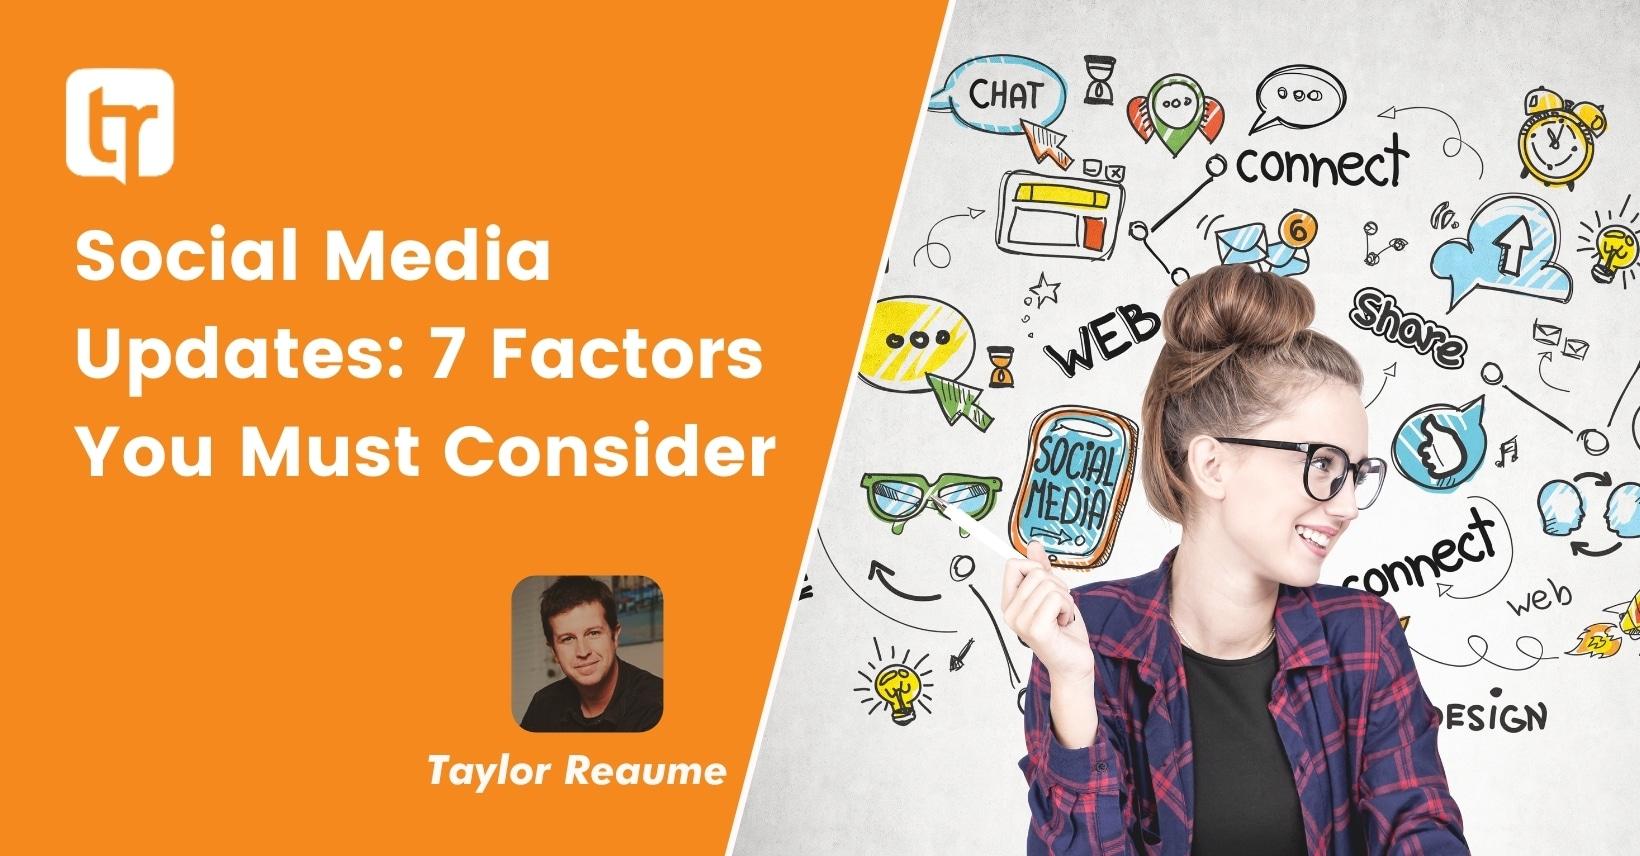 Social Media Updates: 7 Factors You Must Consider